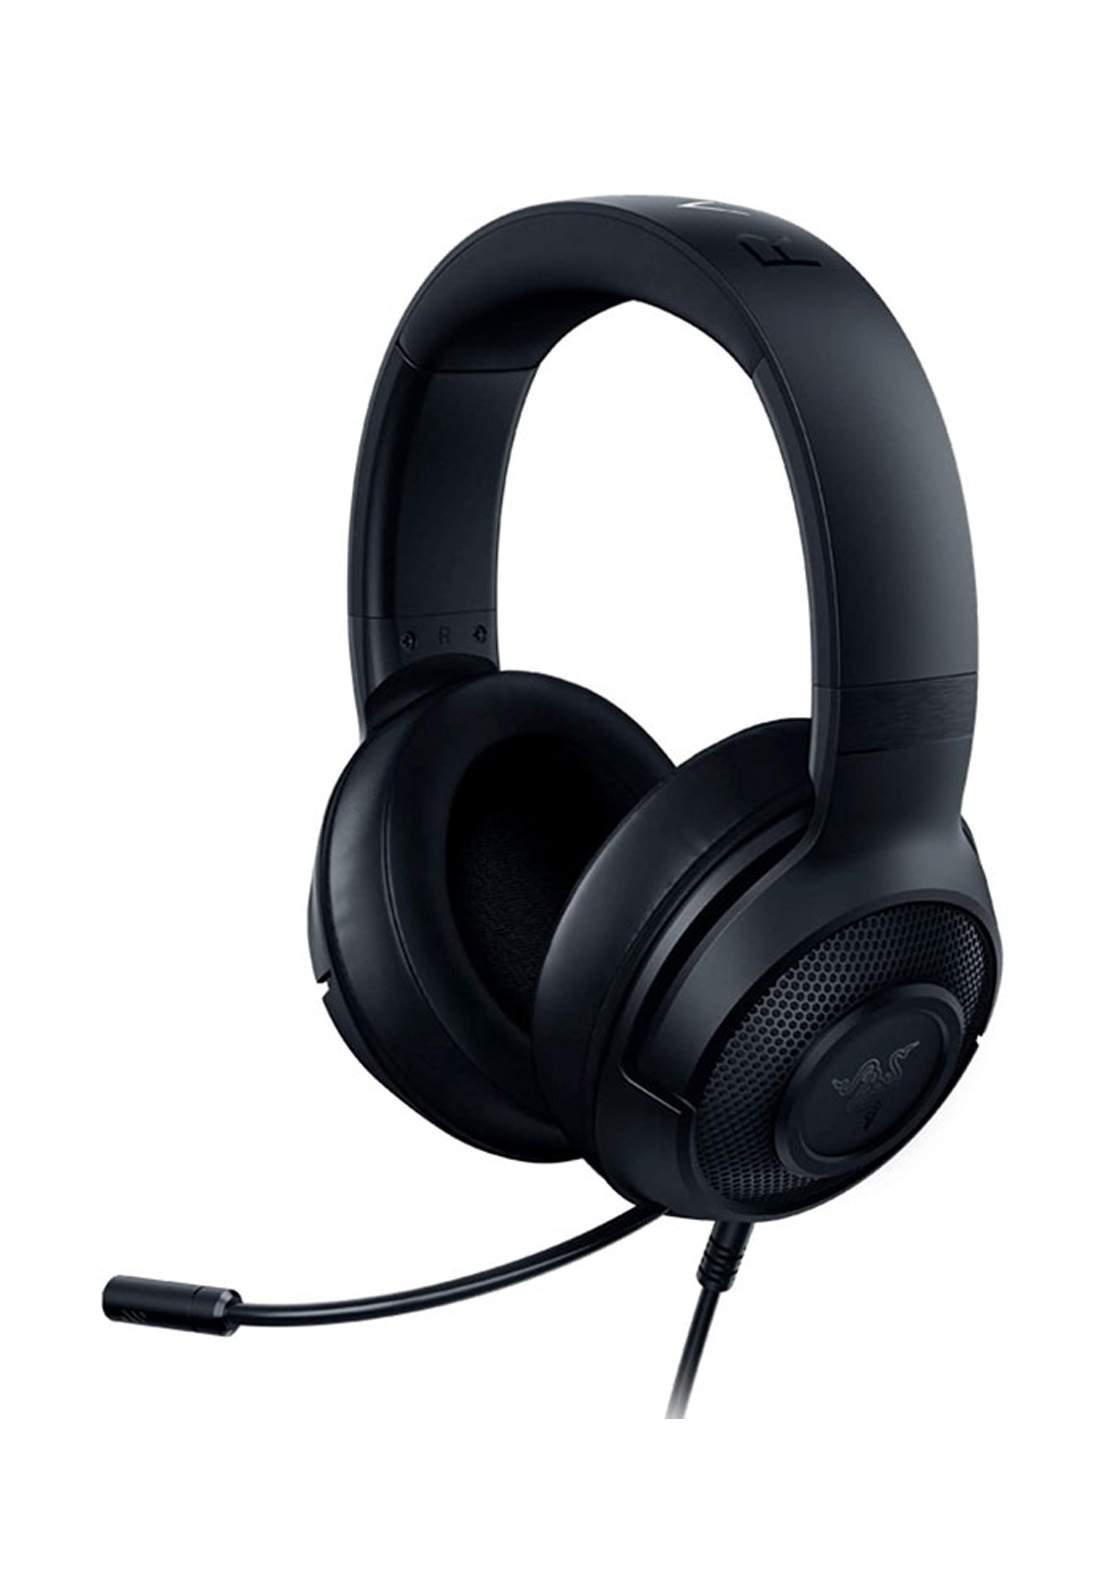 Razer Kraken X Lite Wired Gaming Headset - Black سماعة رأس